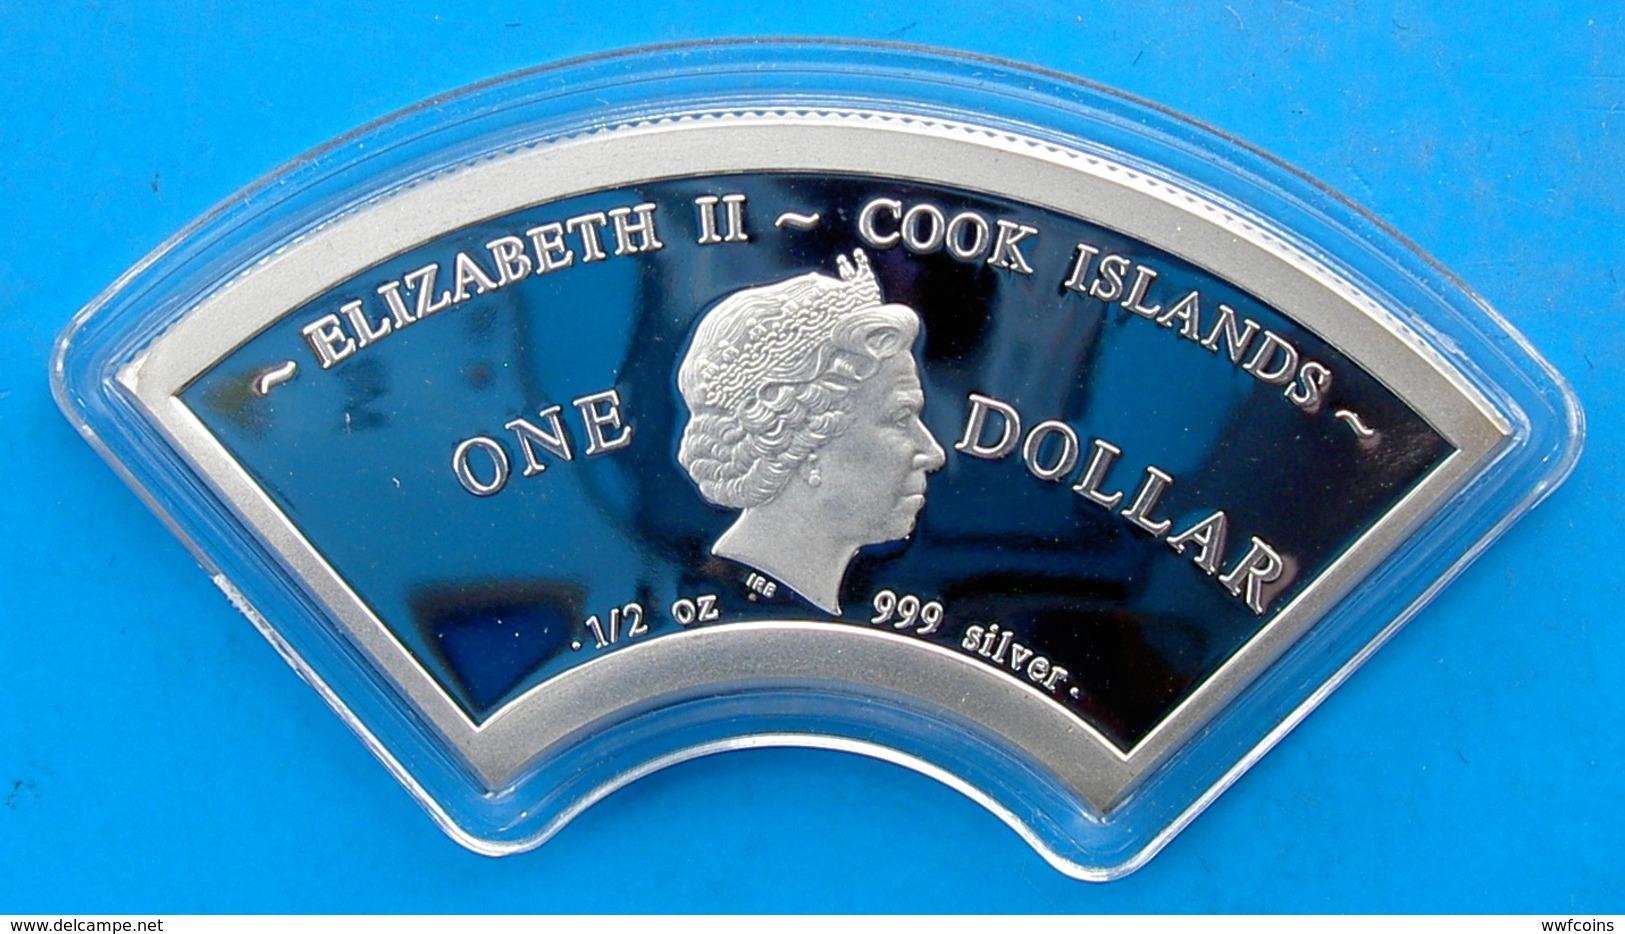 COOK ISLANDS 1 $ 2013 SILVER 999 FAN-SHAPED COBRA SNAKE SERPENTE CHINESE CALENDAR WEIGHT 15,5 TITOLO 0,999 CONSERVAZIONE - Cook